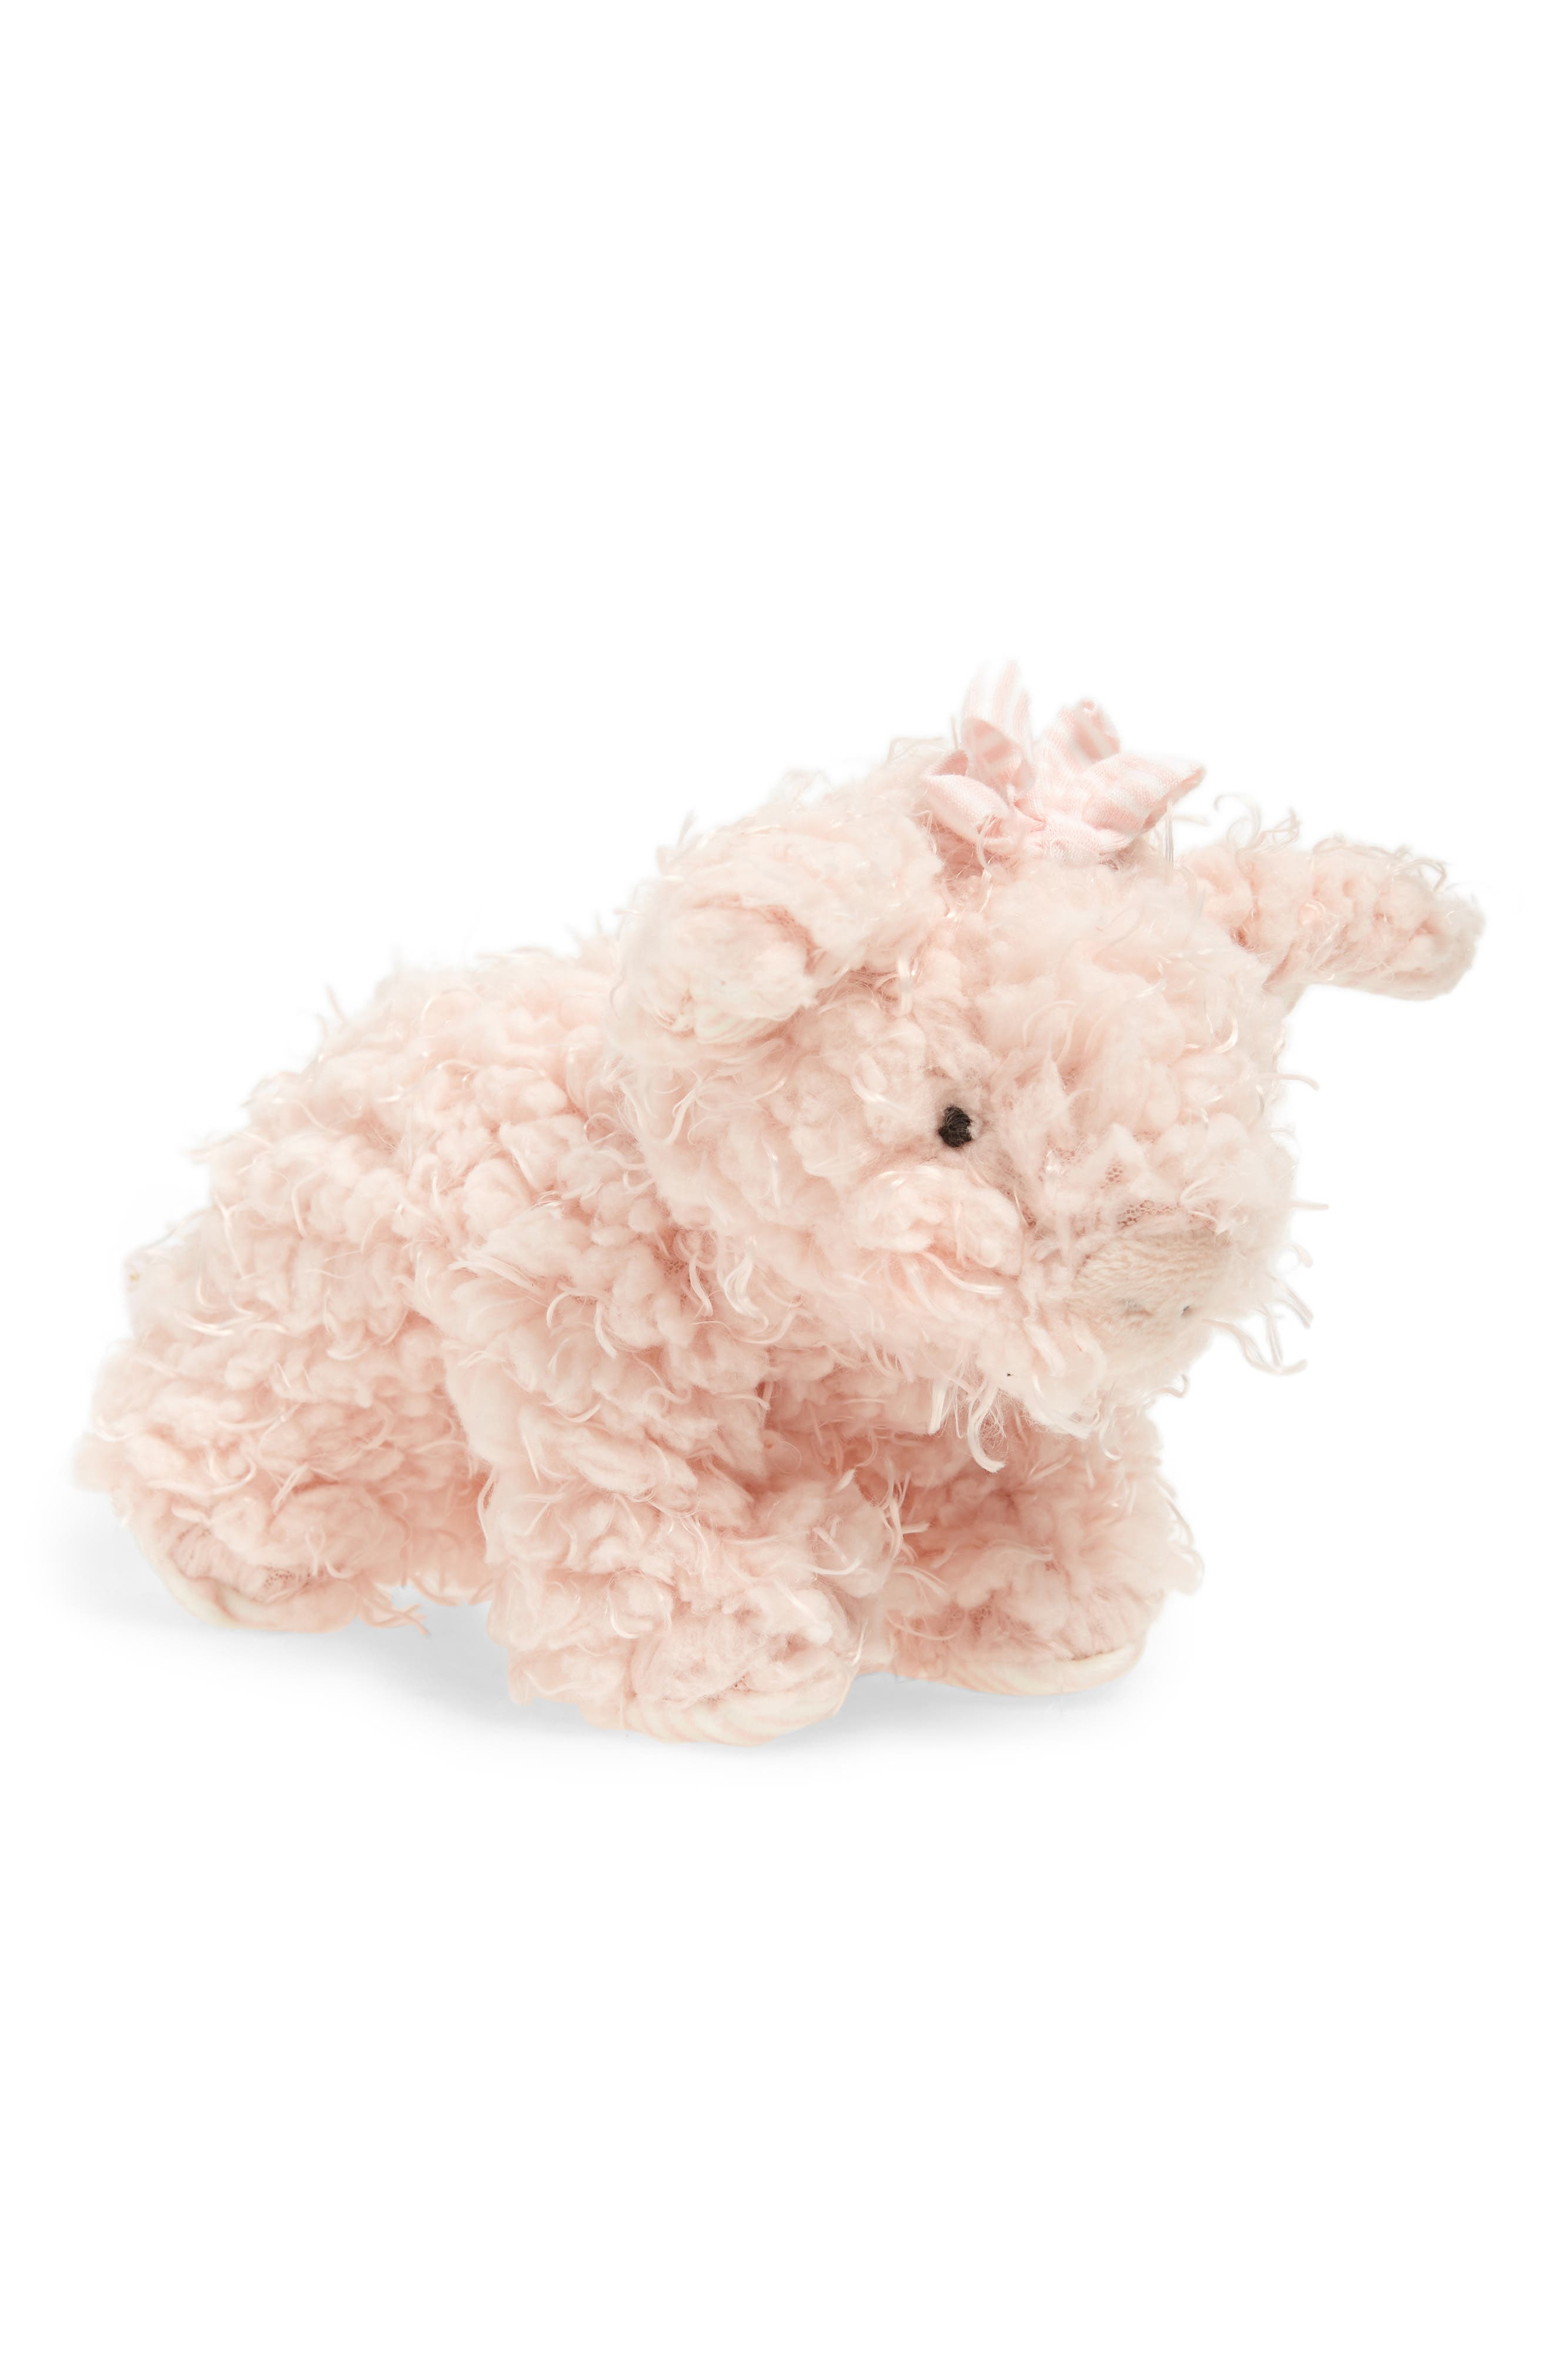 Patty Pig Stuffed Animal,                             Main thumbnail 1, color,                             Peony Pink